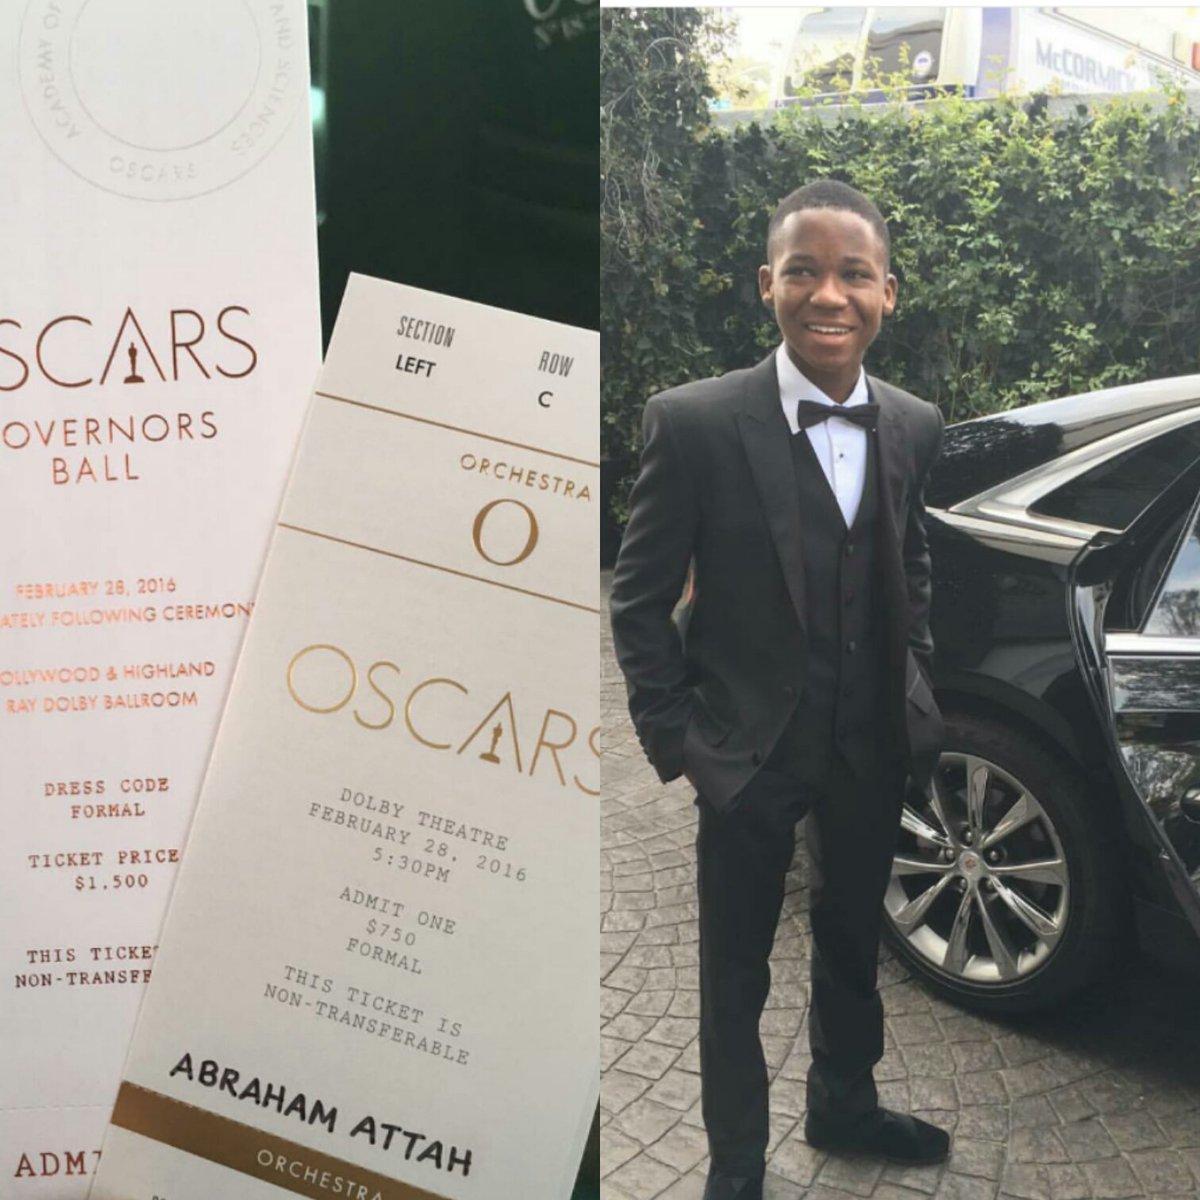 Ghana's Abraham Attah  to present an award at #Oscars tonight #Oscars2016 #OscarsSoWhite https://t.co/6RVCQqWbky